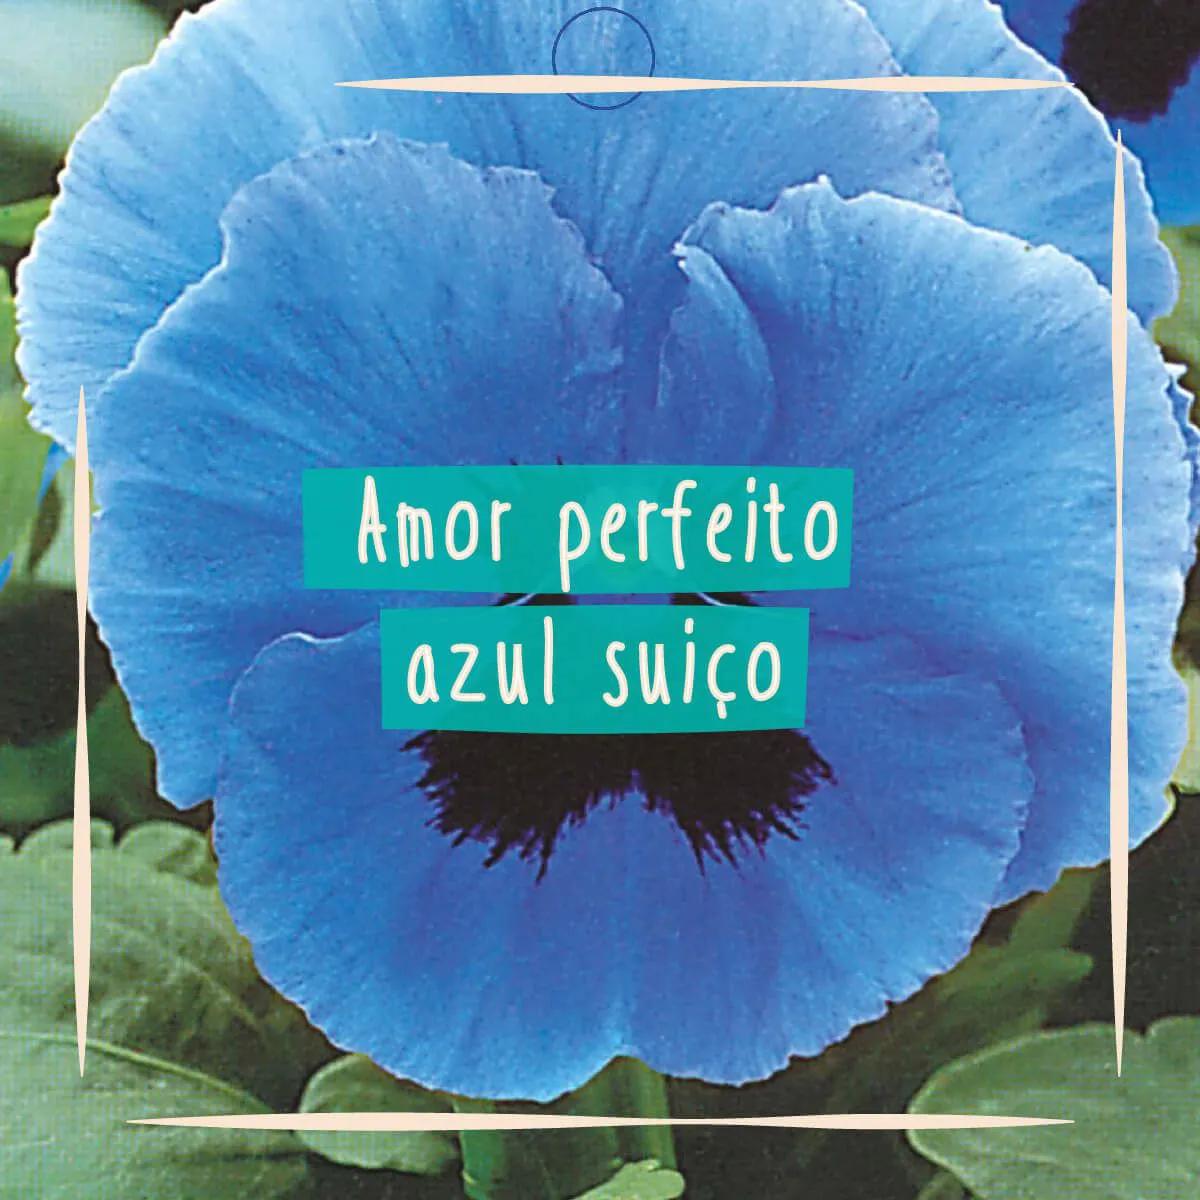 Sementes para plantar Amor Perfeito Azul Gigante em vasos autoirrigáveis RAIZ  - Vasos Raiz Loja Oficial